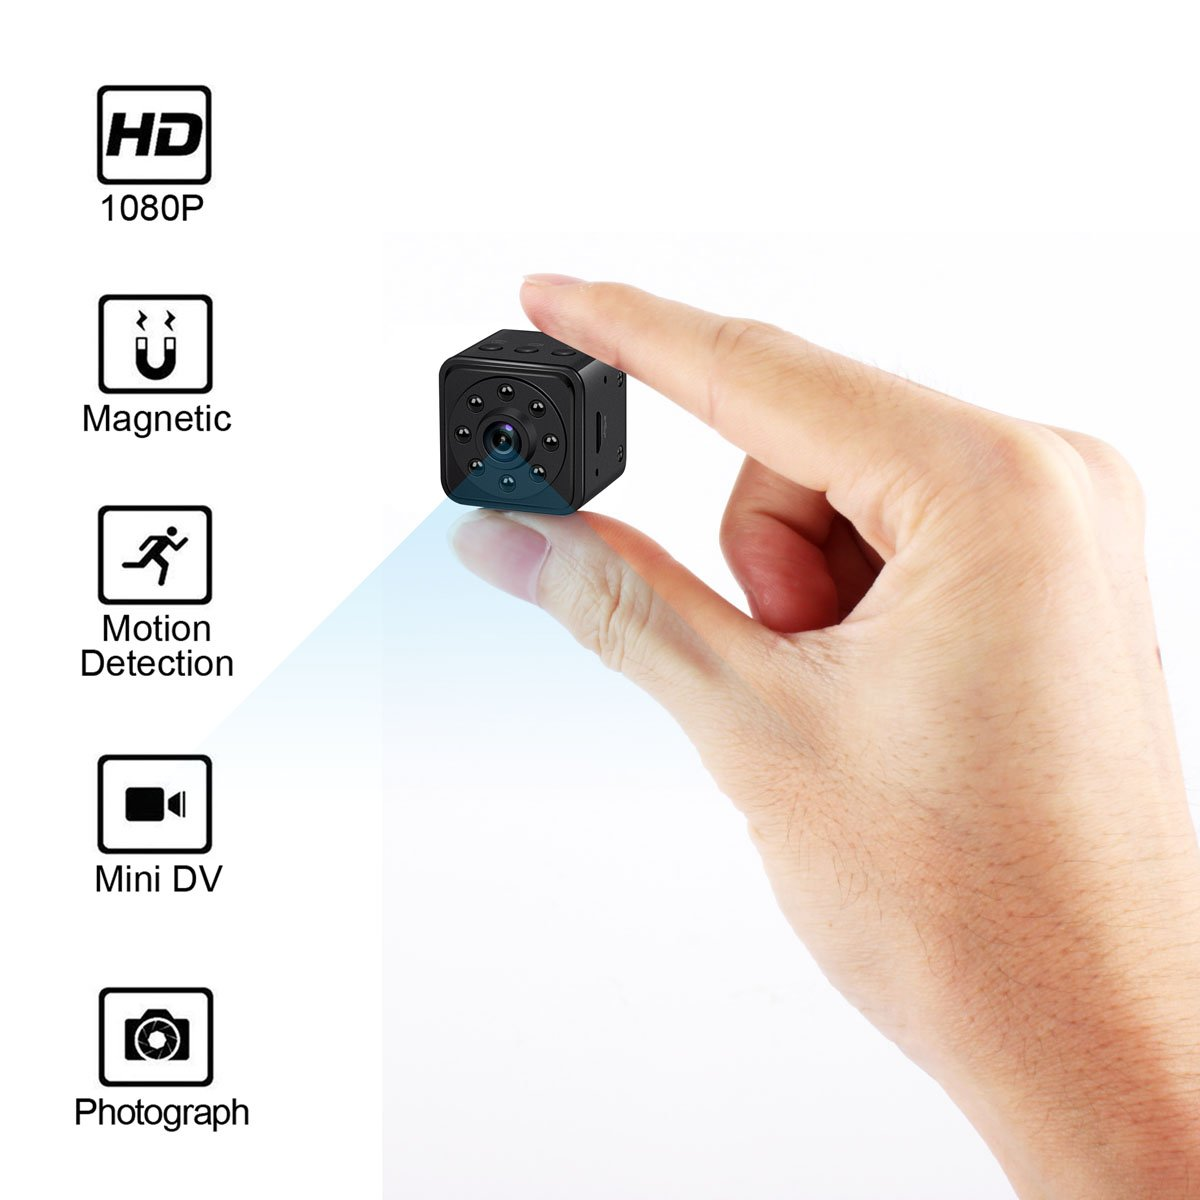 Mini Spy Camera Hidden Camera HoHoProv HD 1080P Portable Mini Nanny Cam Security Camera with Motion Detection and Night Vision by HoHoProv